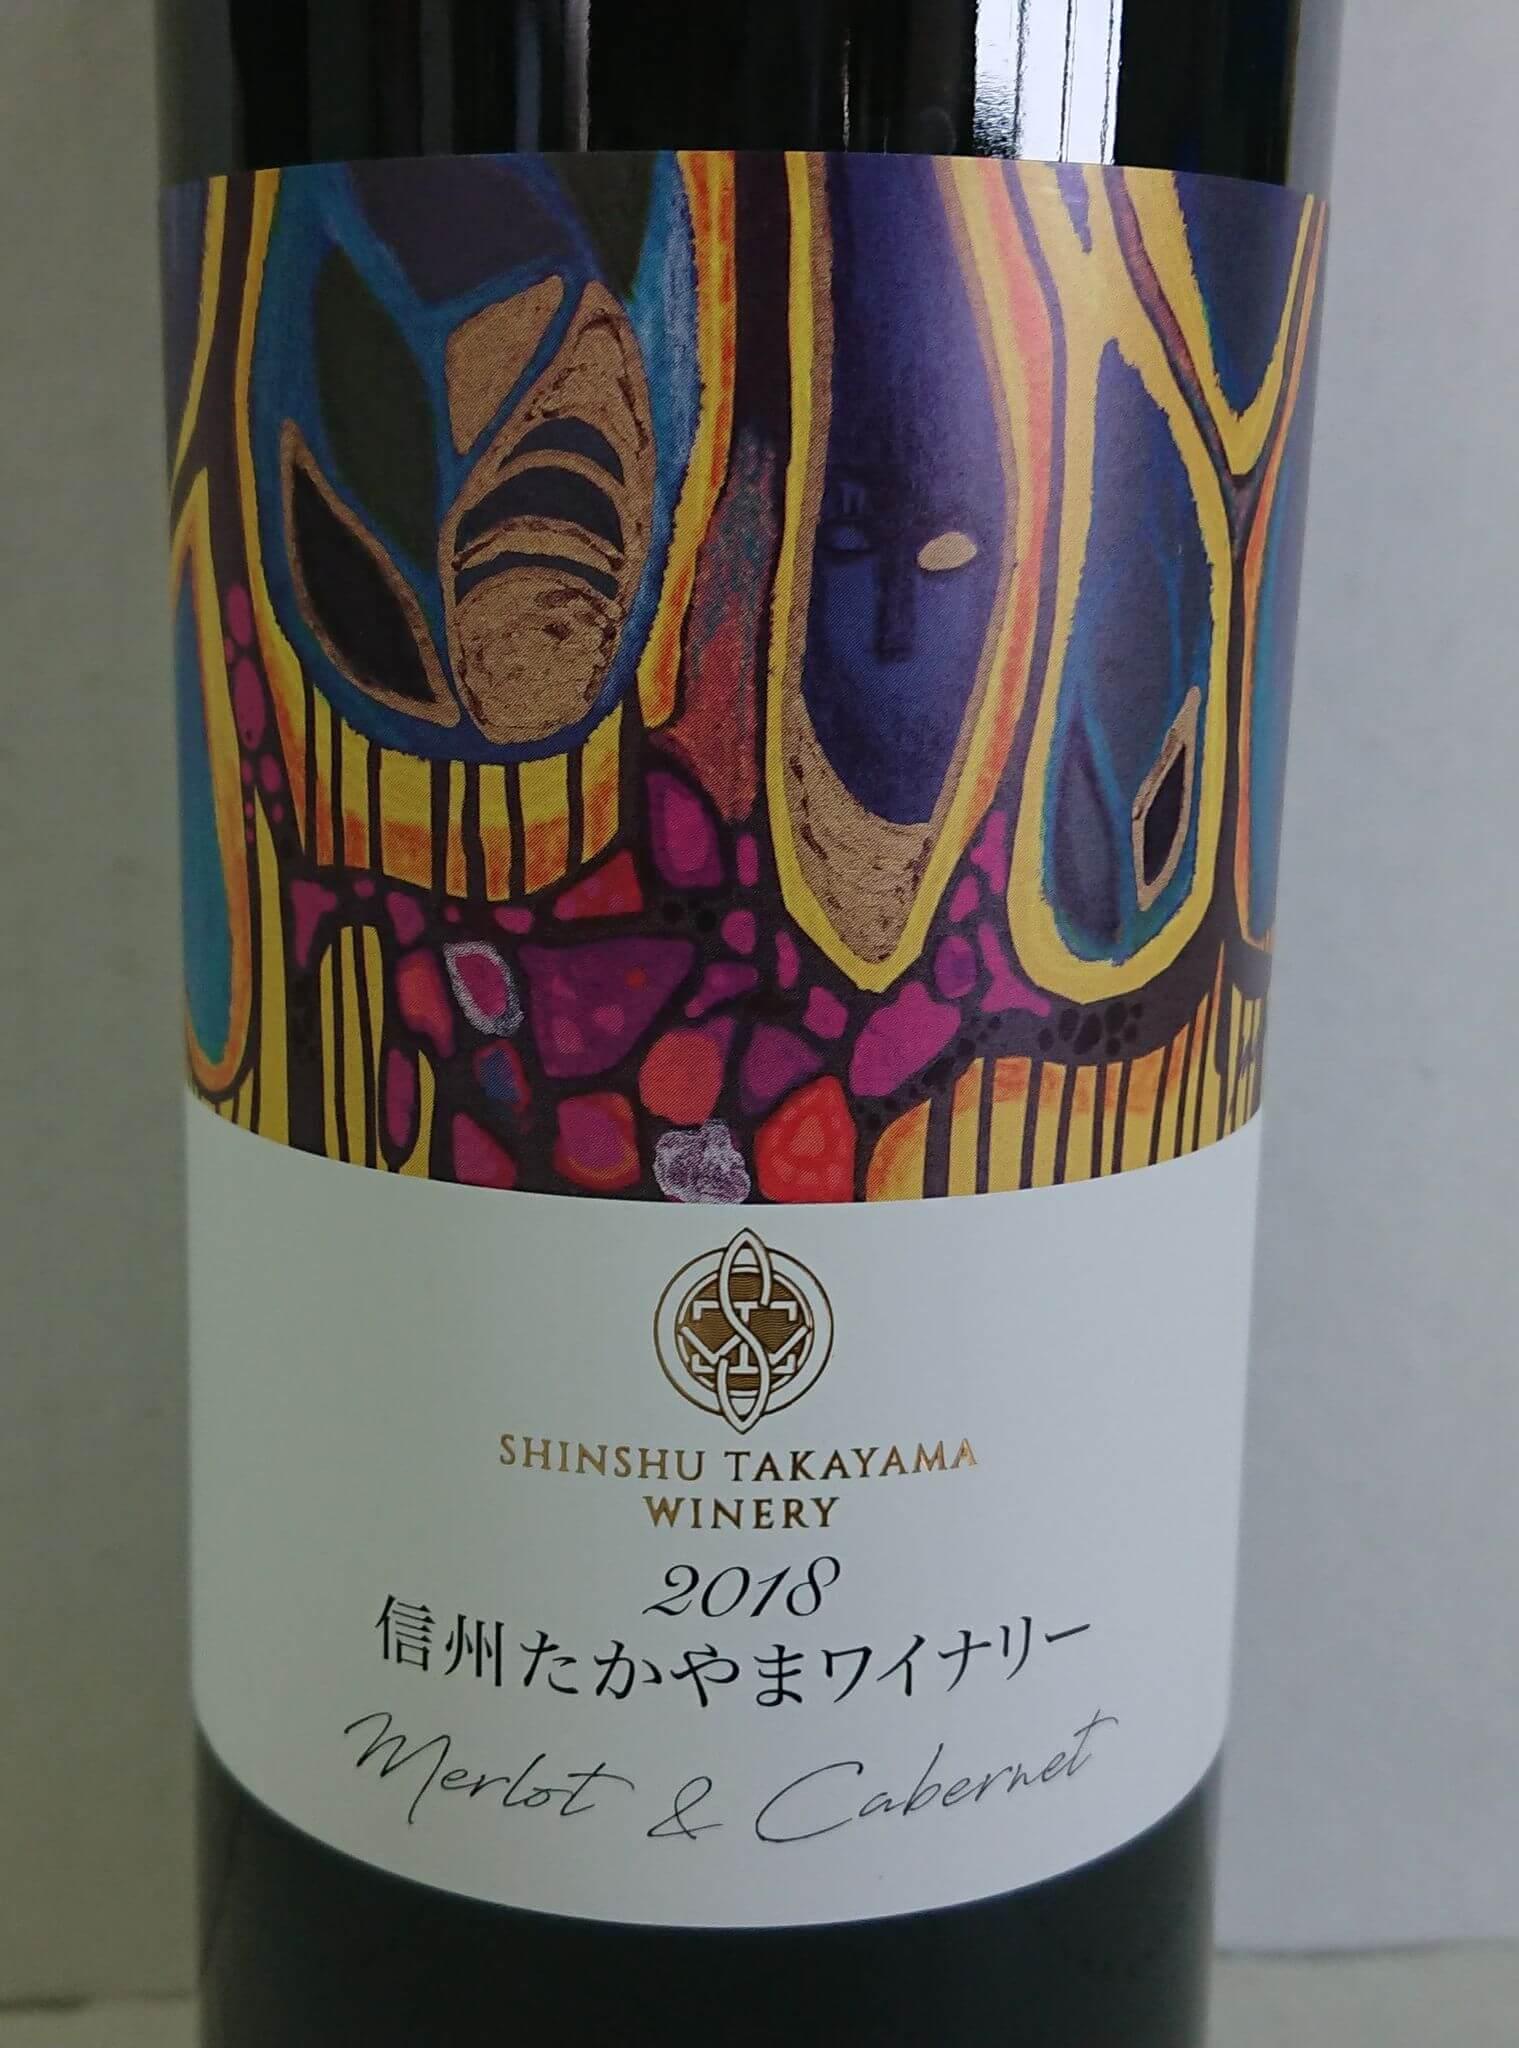 shinshu-takayama-merlot-cabernet